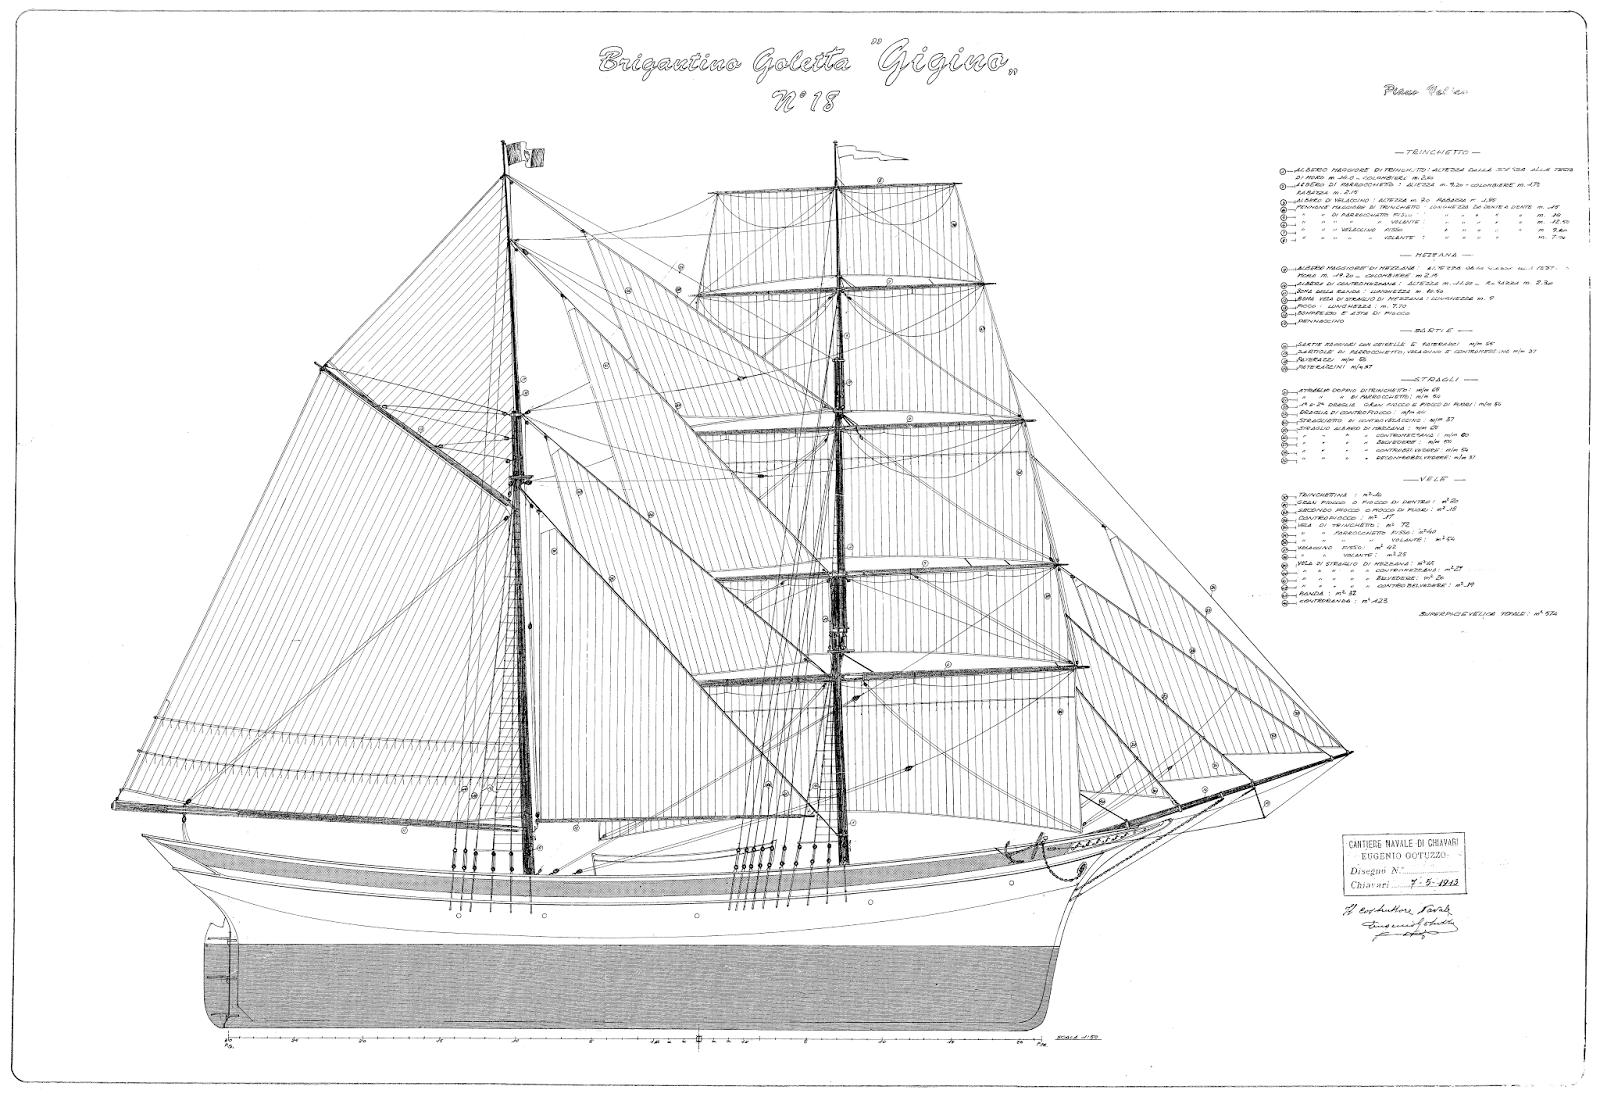 free ship plans, sailing, vessels, brigantine, schooner, Italian 20th century, Gigino